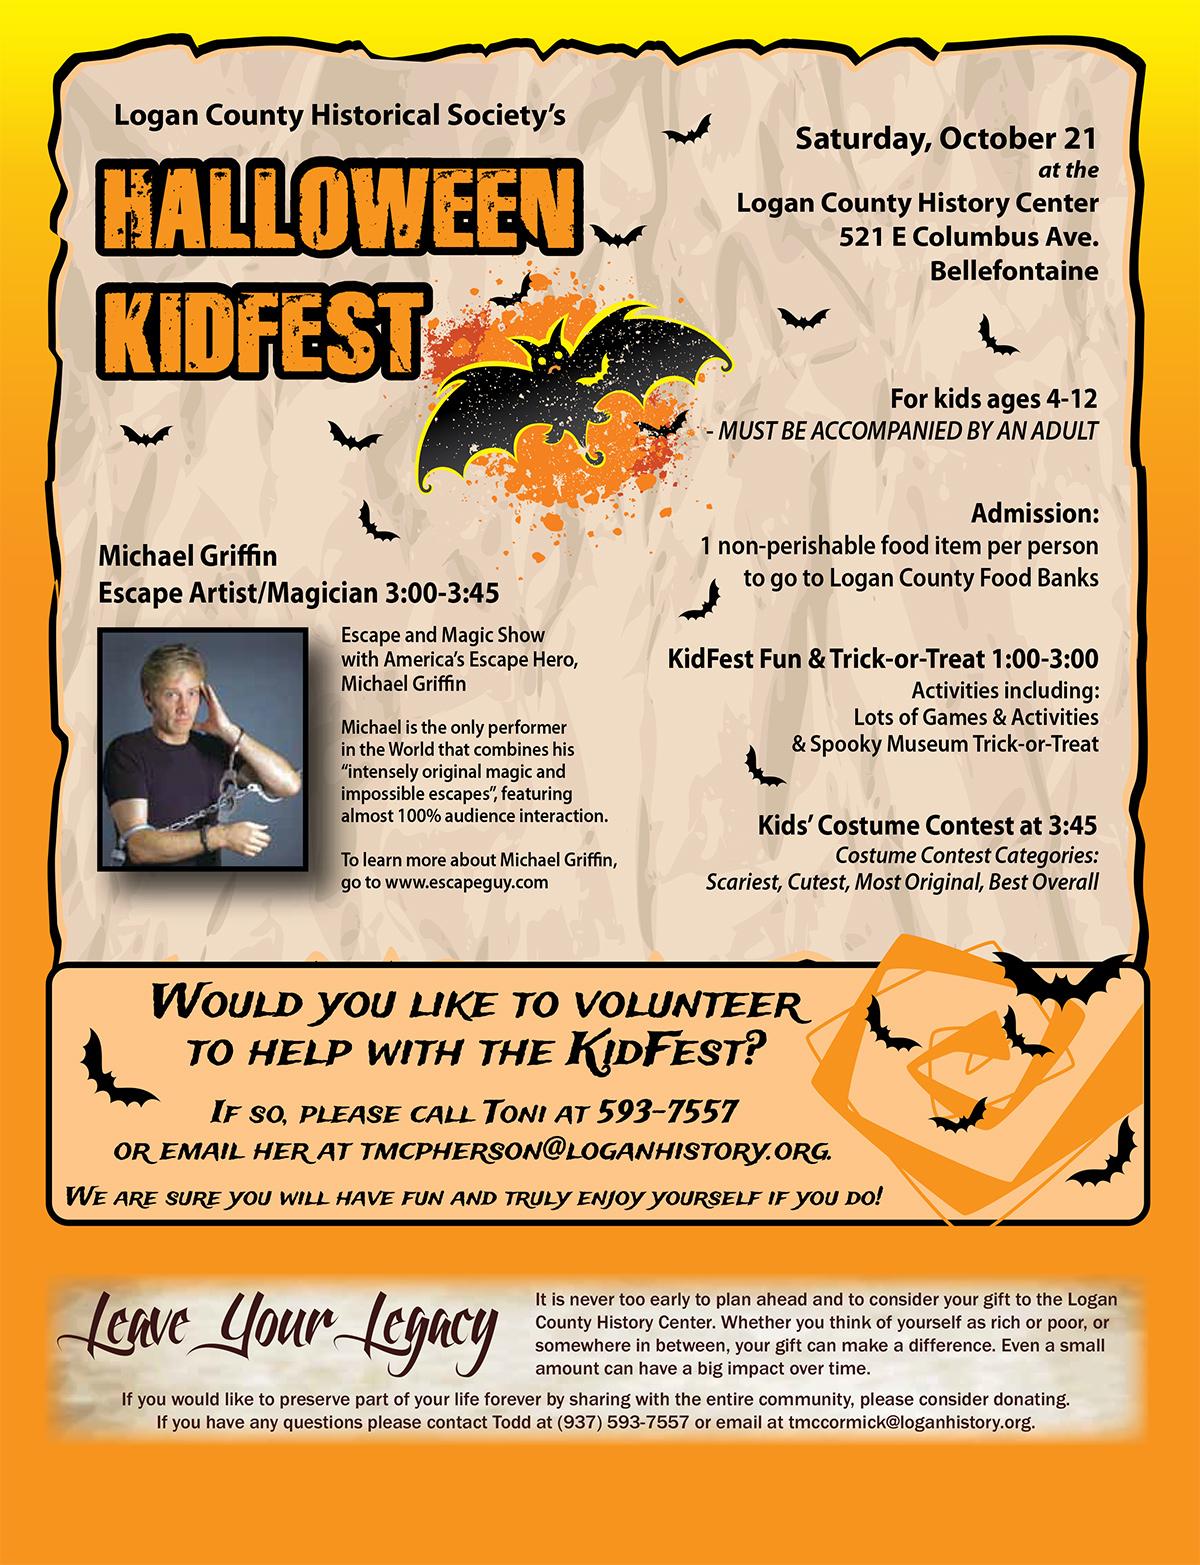 Halloween Kidfest with Michael Griffin Escape Artist